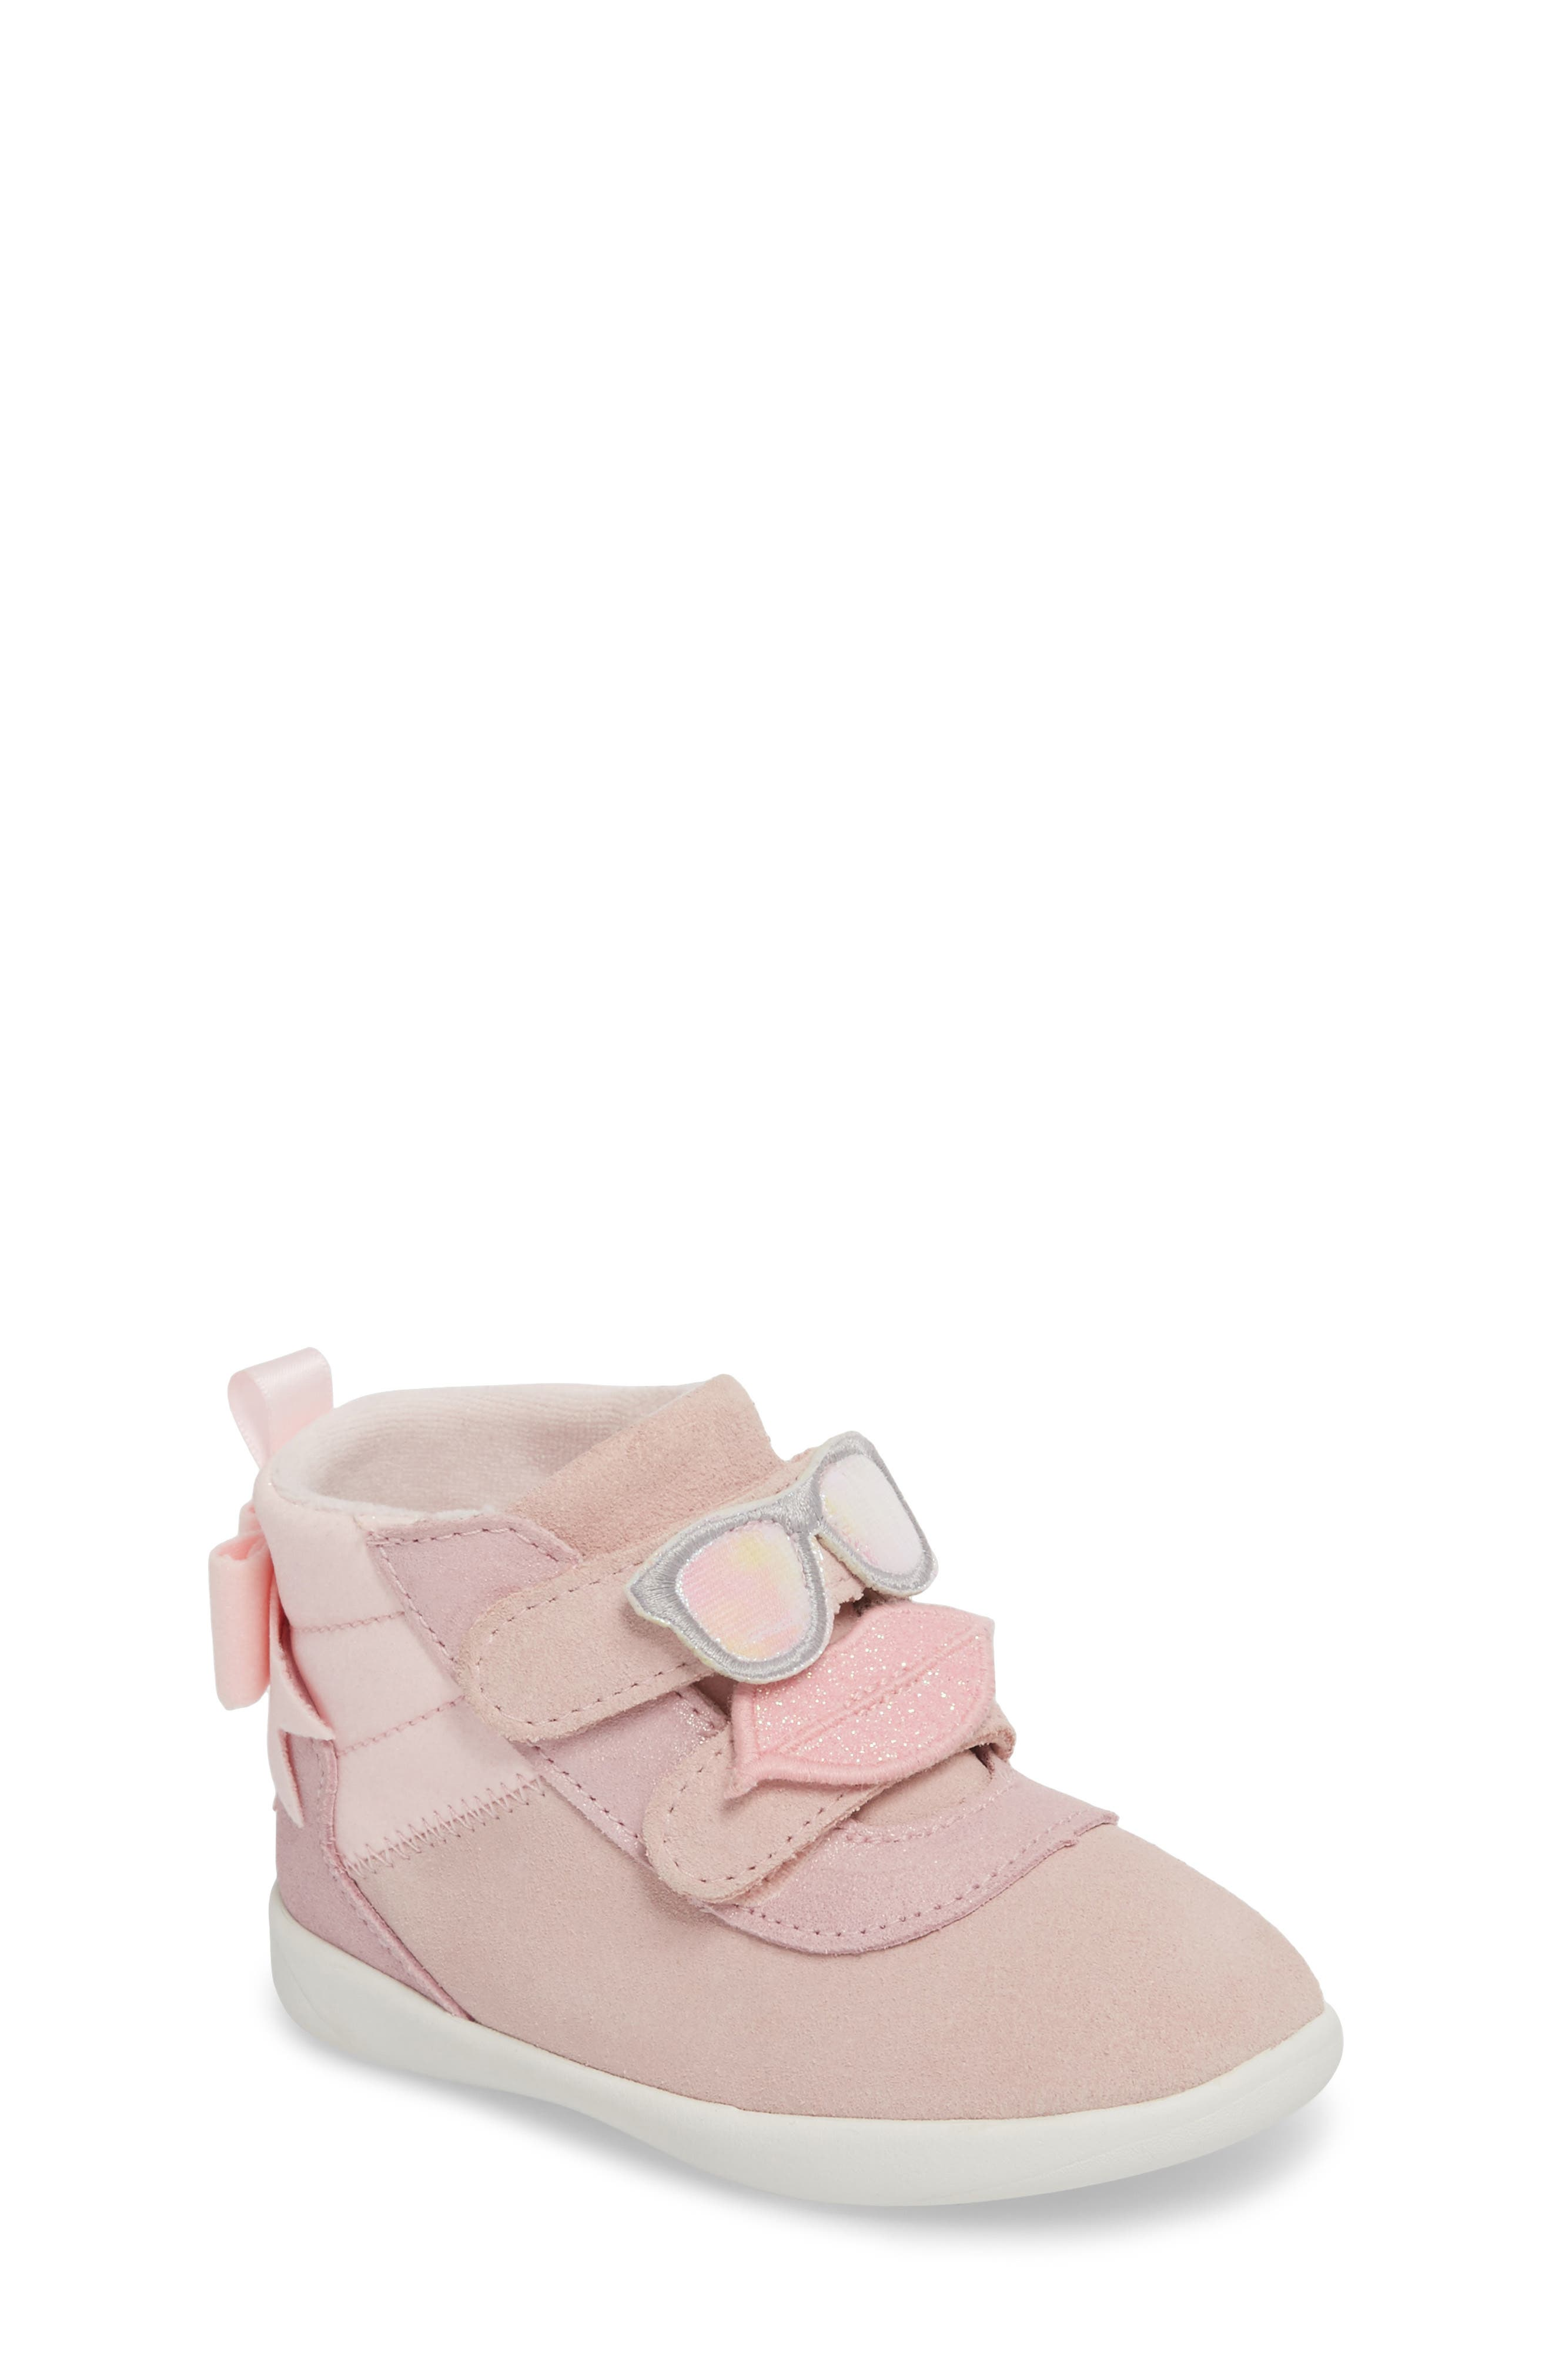 Livv Sunglass Appliqué Sneaker,                             Main thumbnail 1, color,                             Seashell Pink